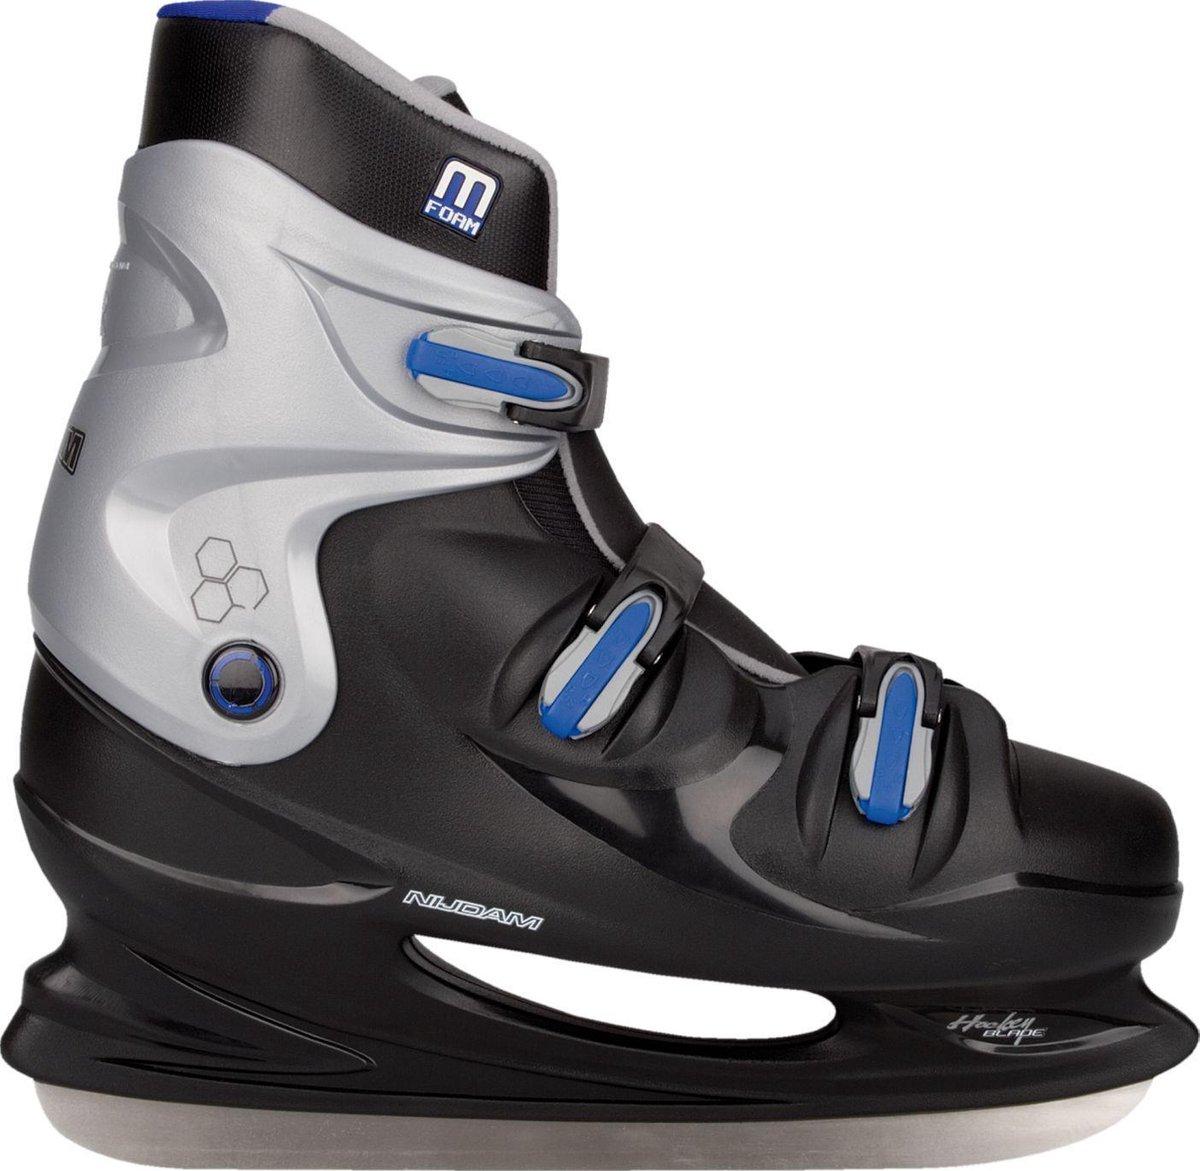 Nijdam IJshockeyschaats XXL - Hardboot - Zwart/Zilver/Blauw - 48